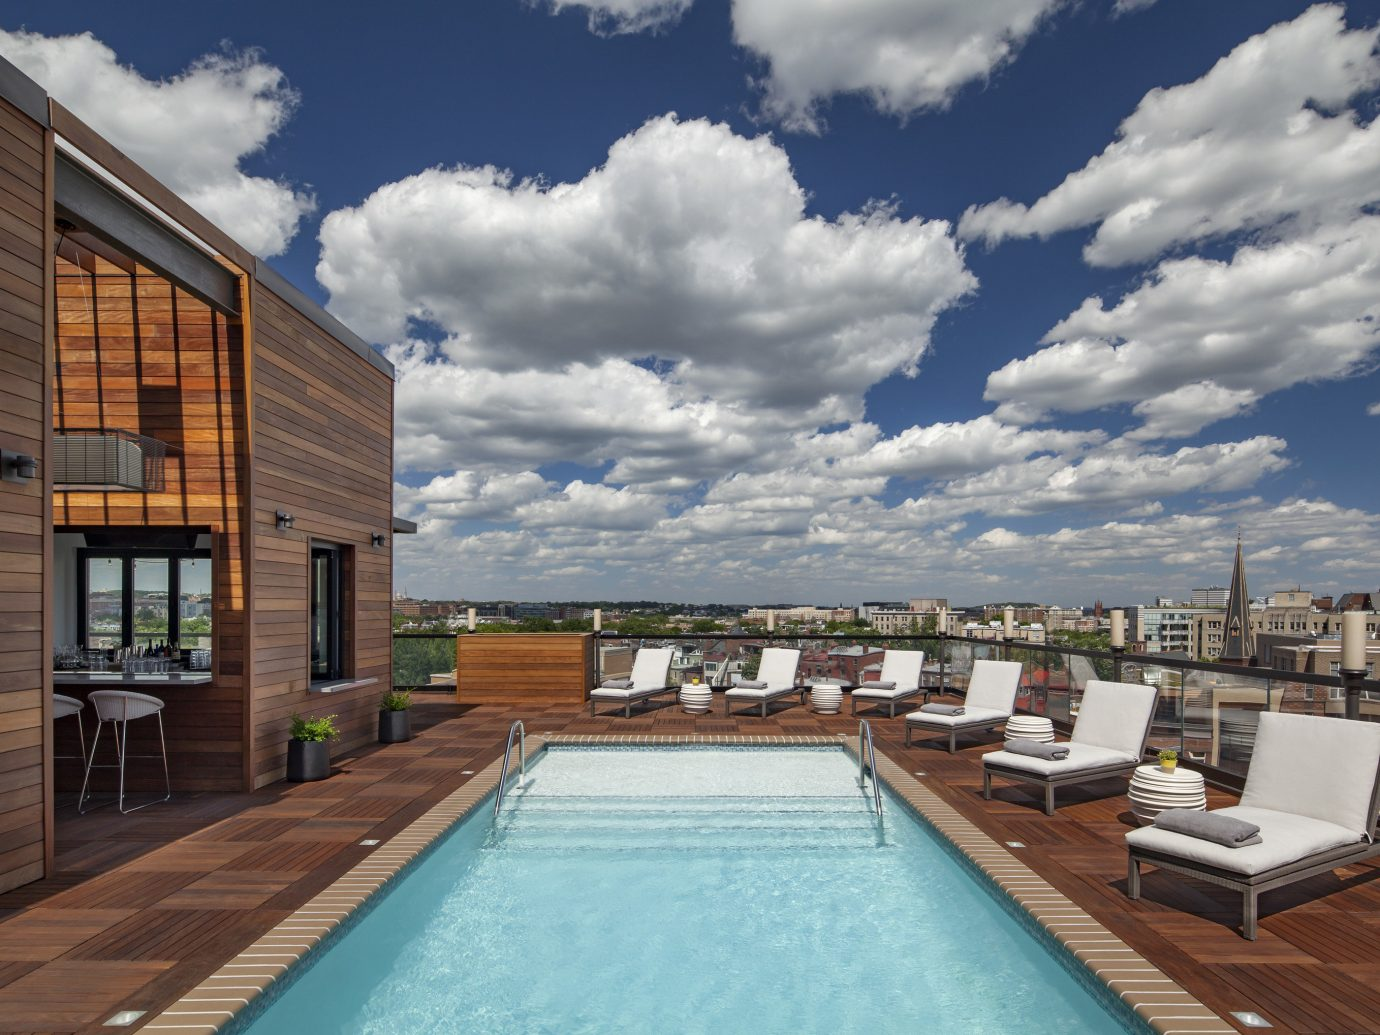 Trip Ideas sky outdoor property condominium estate house swimming pool real estate home Resort facade residential area apartment